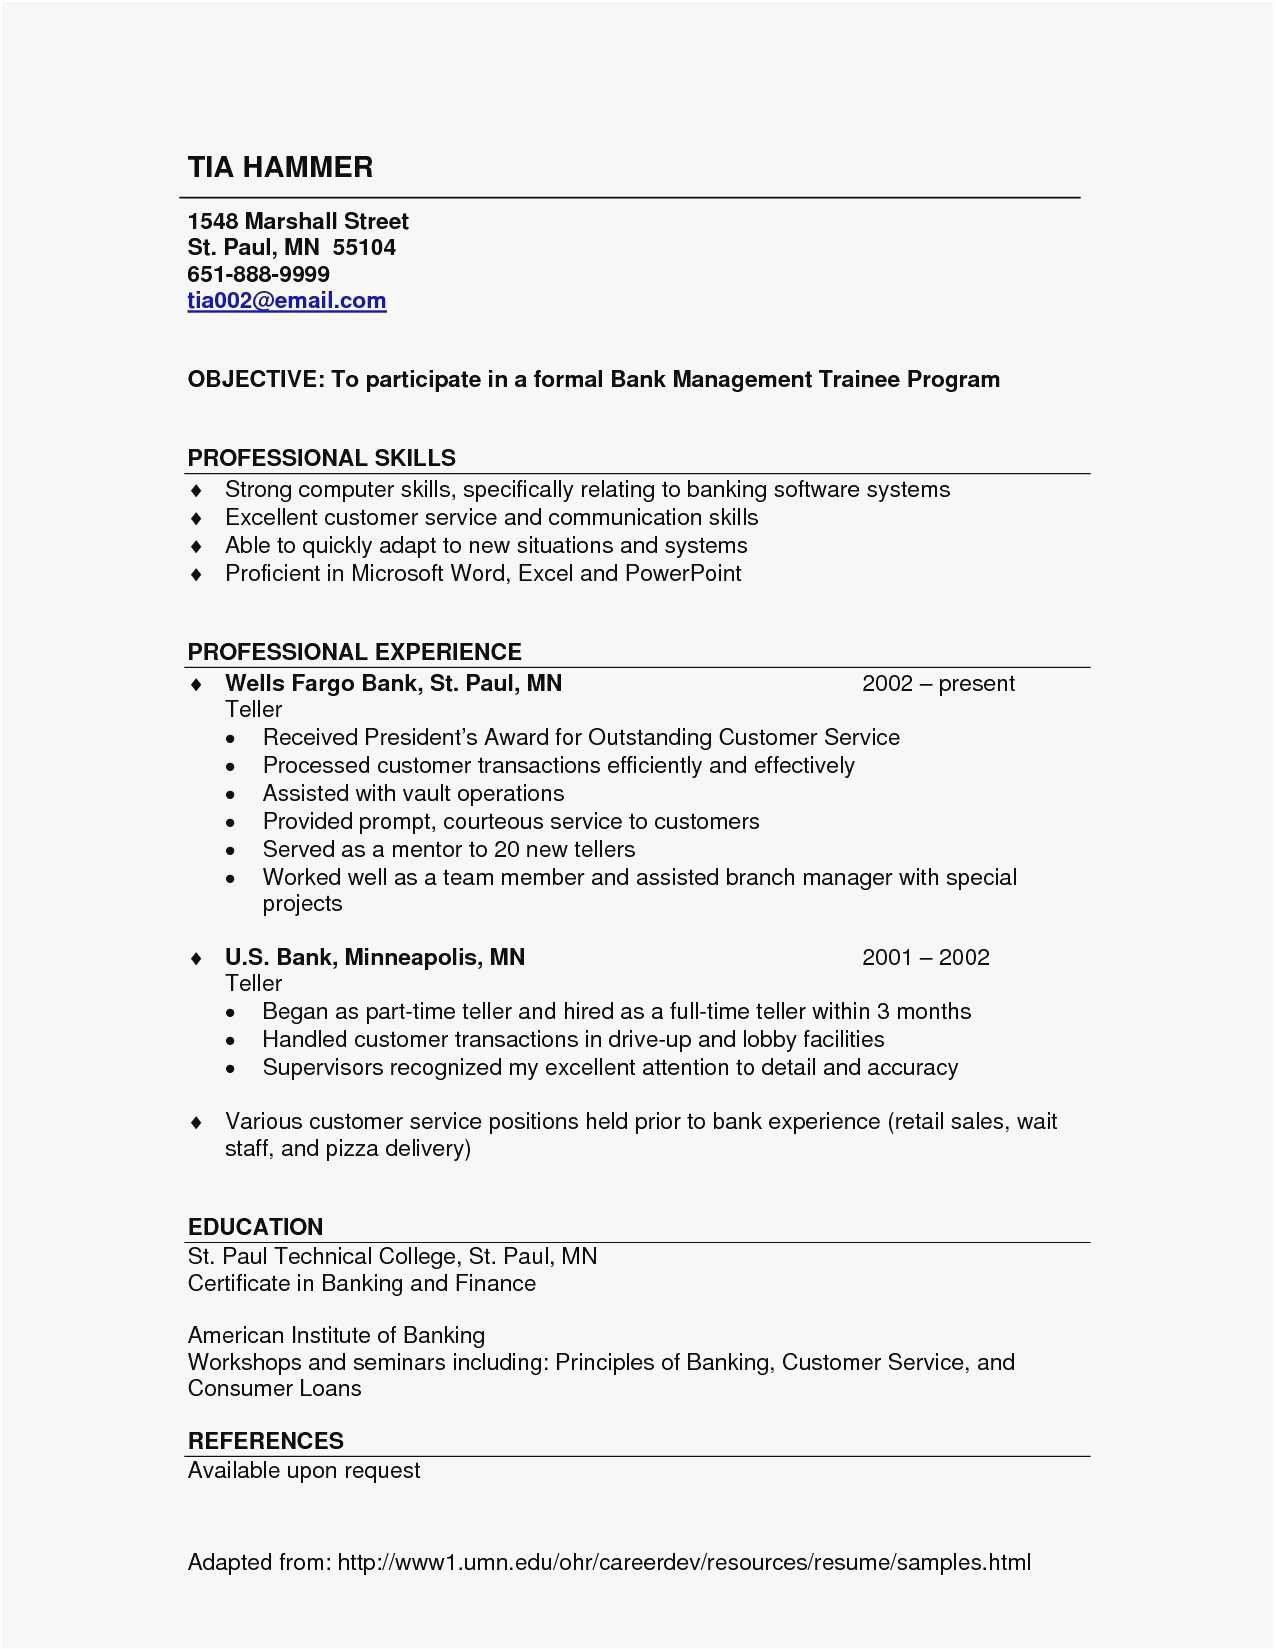 Microsoft Publisher Award Certificate Templates In 2020 Job